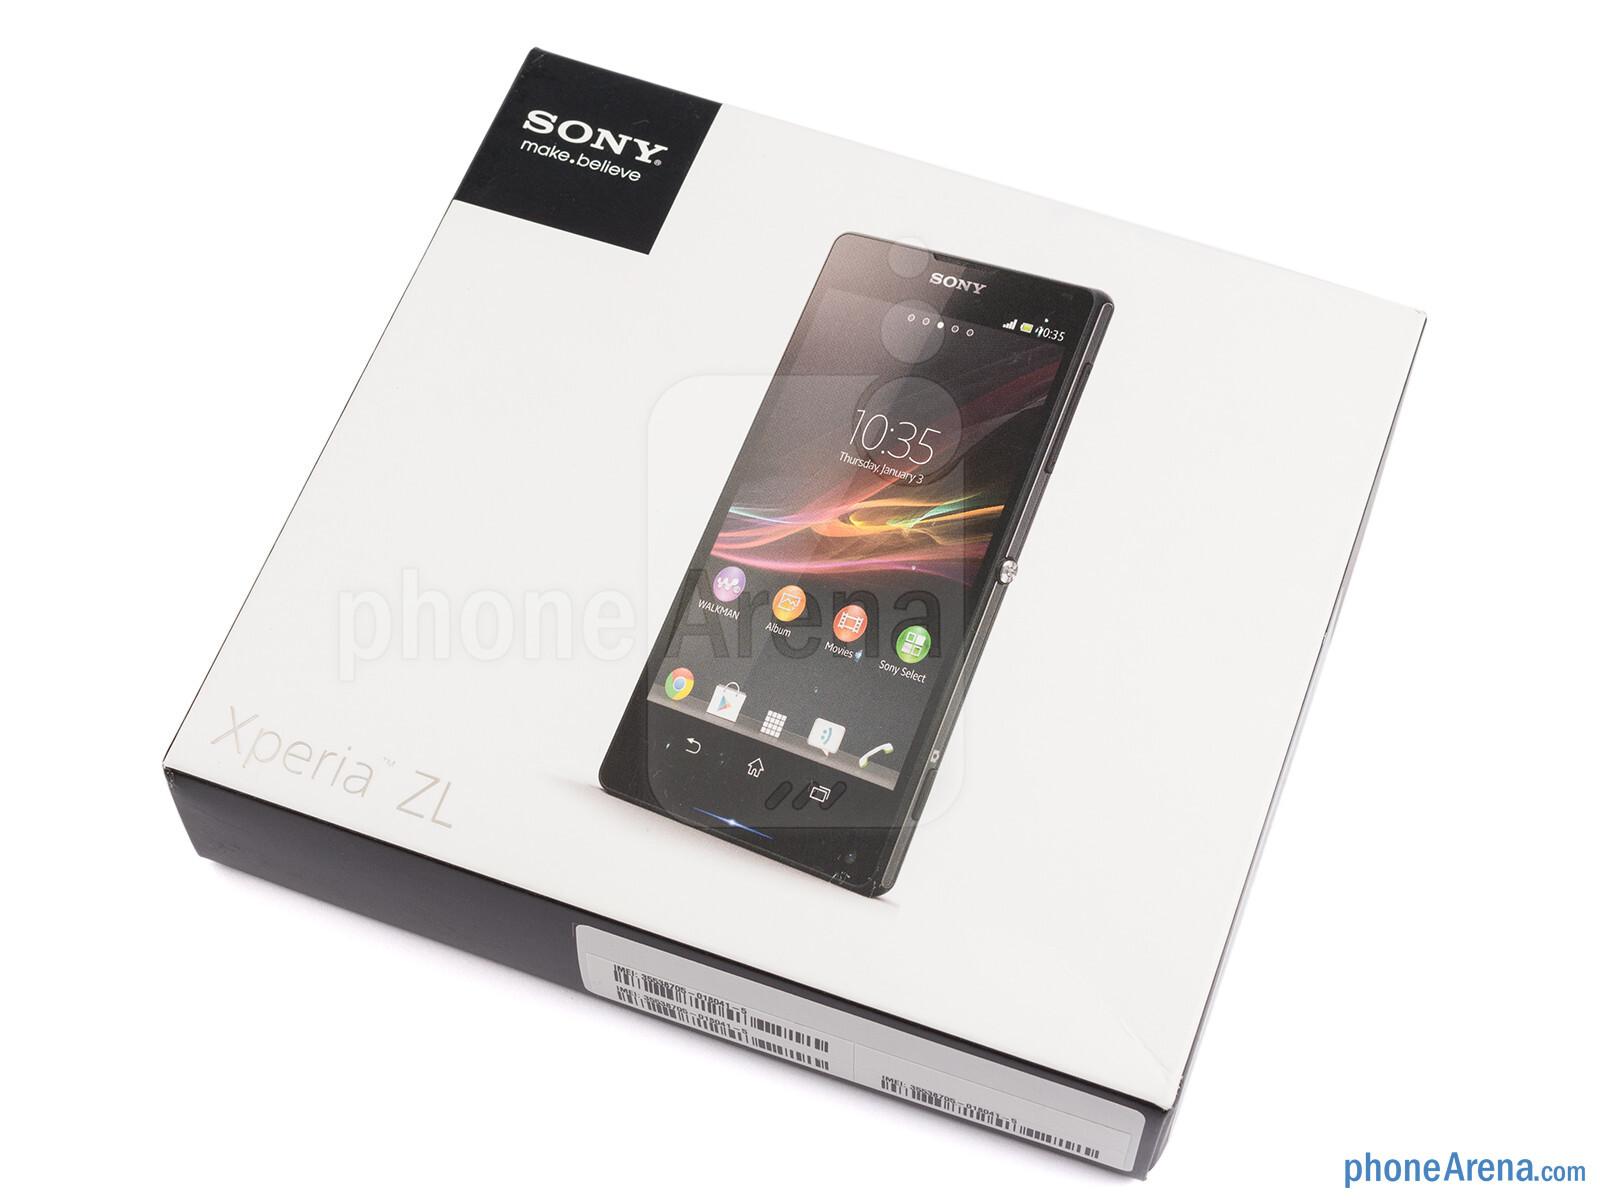 Xperia Zl Sony Xperia ZL Review